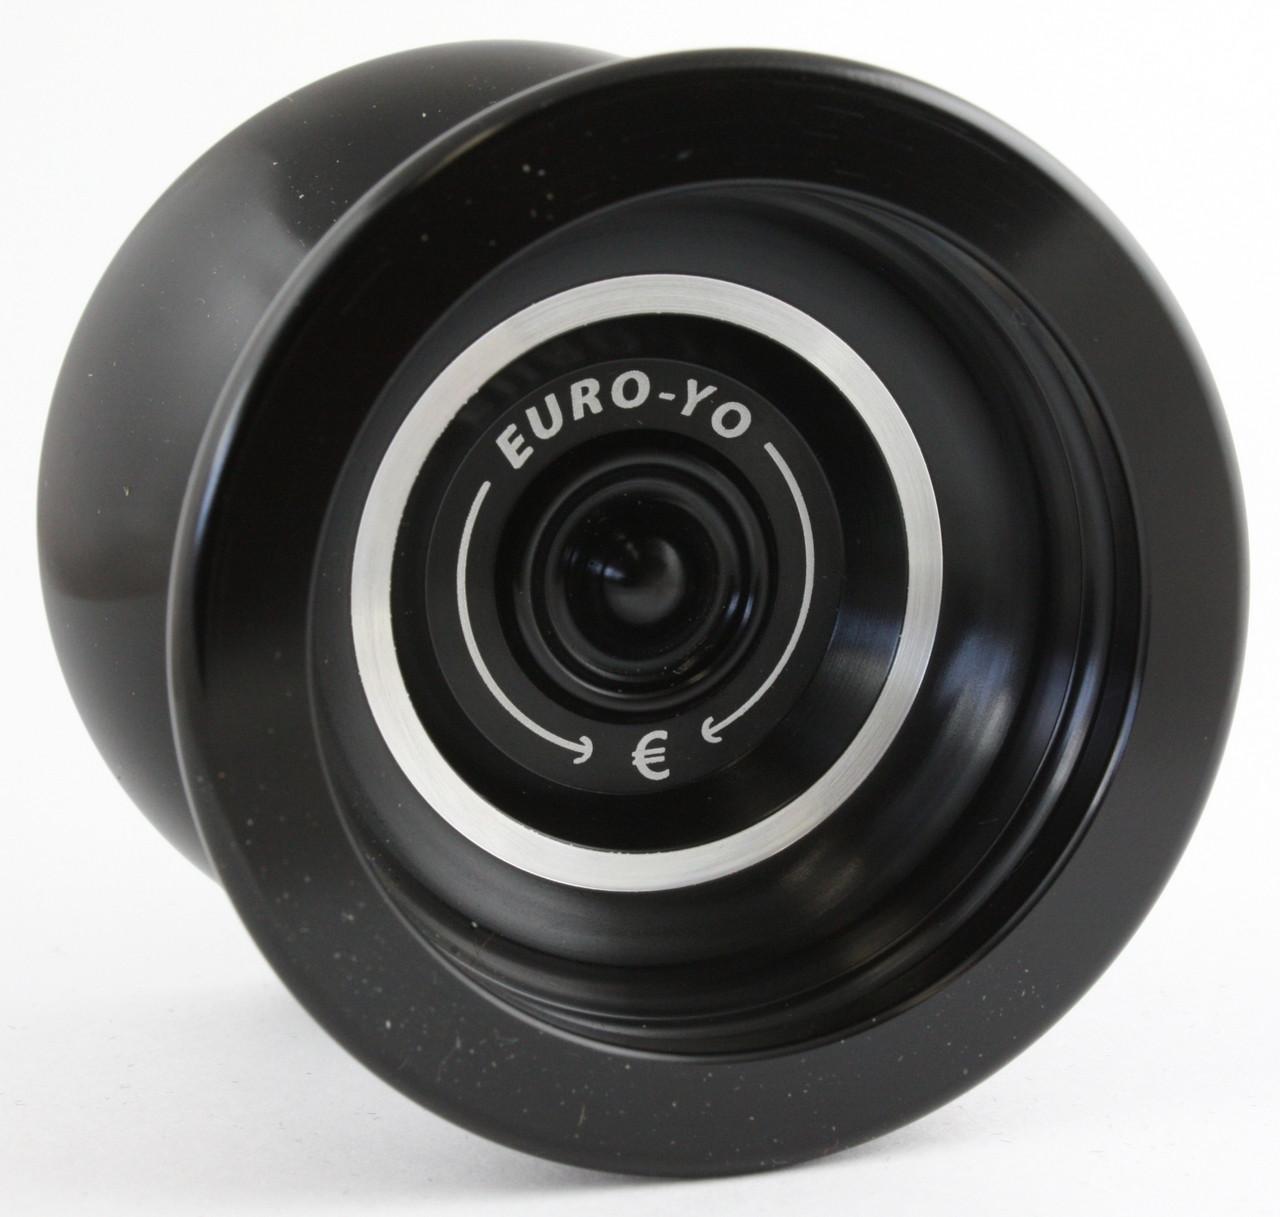 Black ... MAGICYOYO Professional Unresponsive Yoyo N11 Alloy Aluminum YoYo Ball